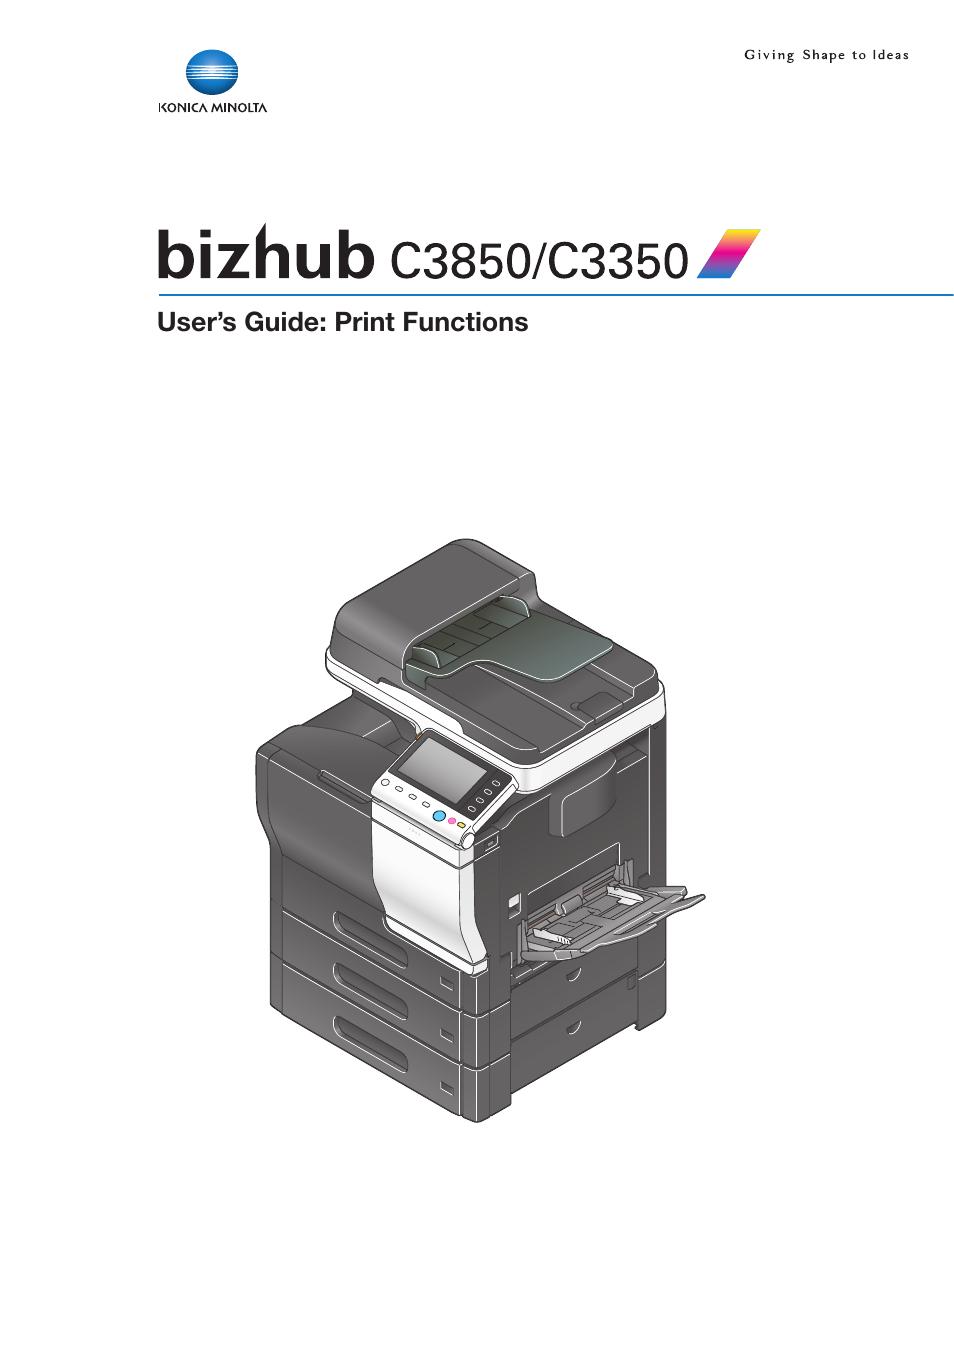 Konica Minolta bizhub C3350 User Manual | 119 pages | Also for: bizhub C3850